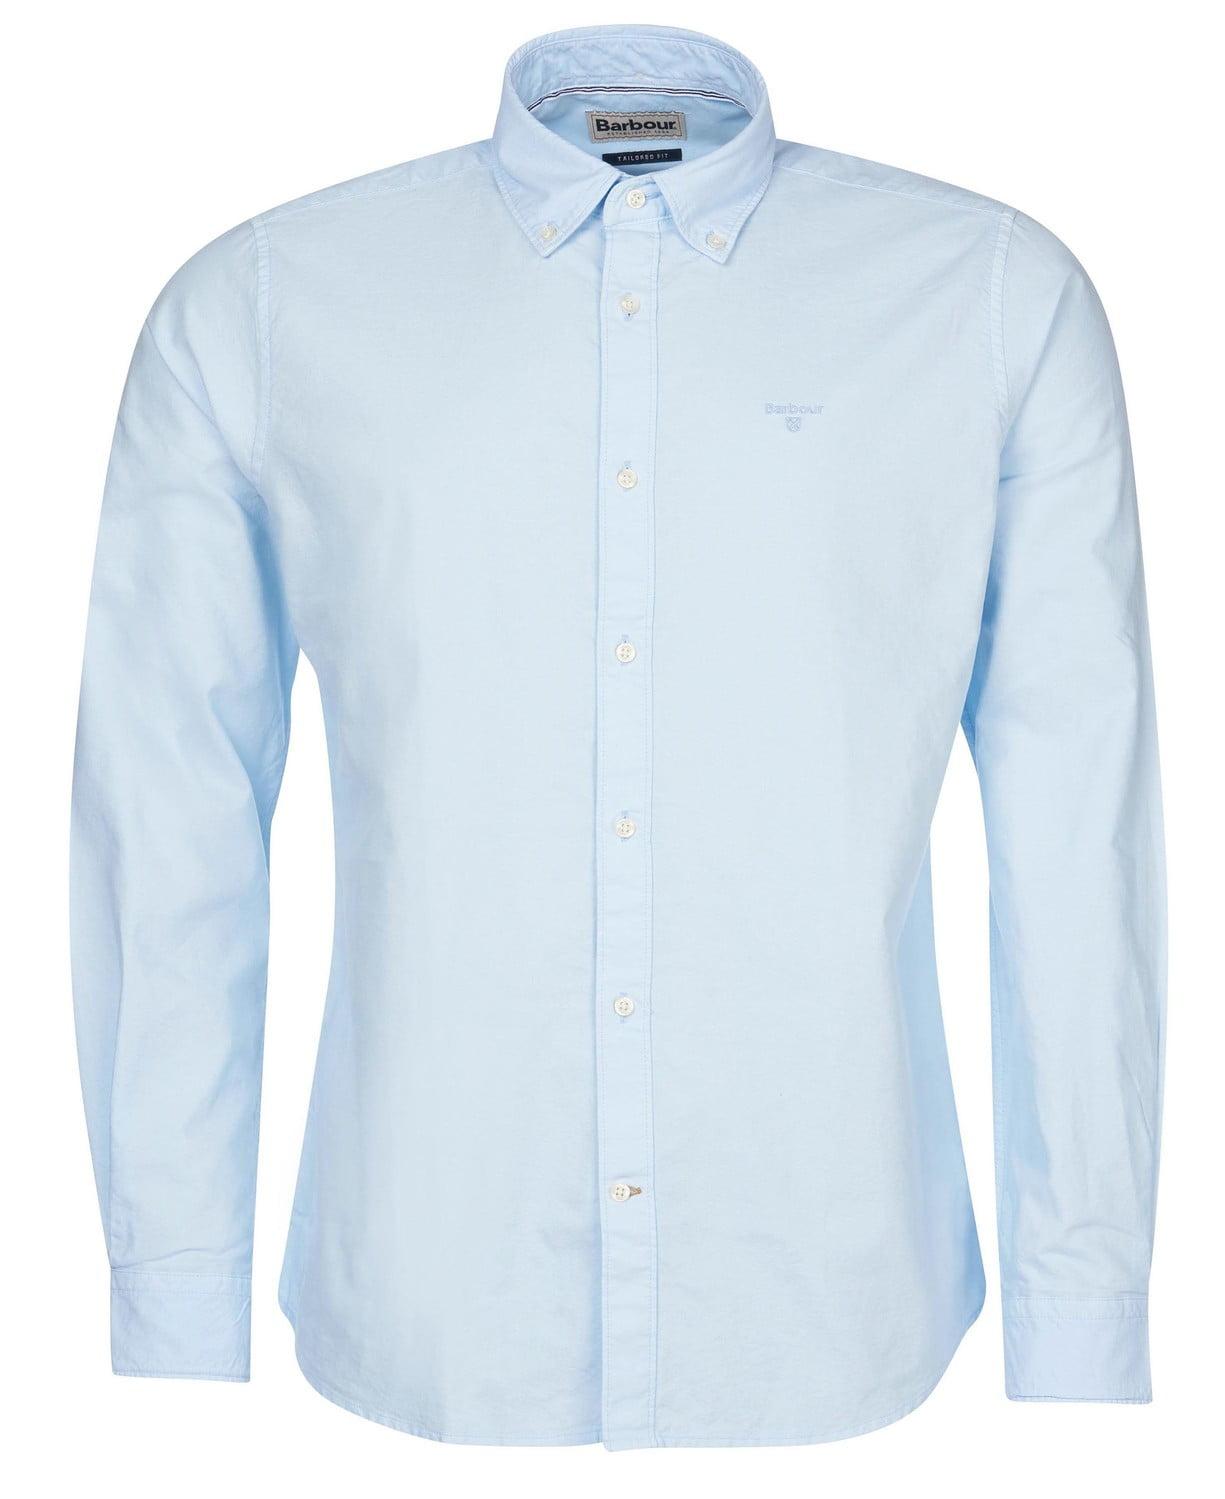 Barbour Oxford shirt4931BL36_02flat